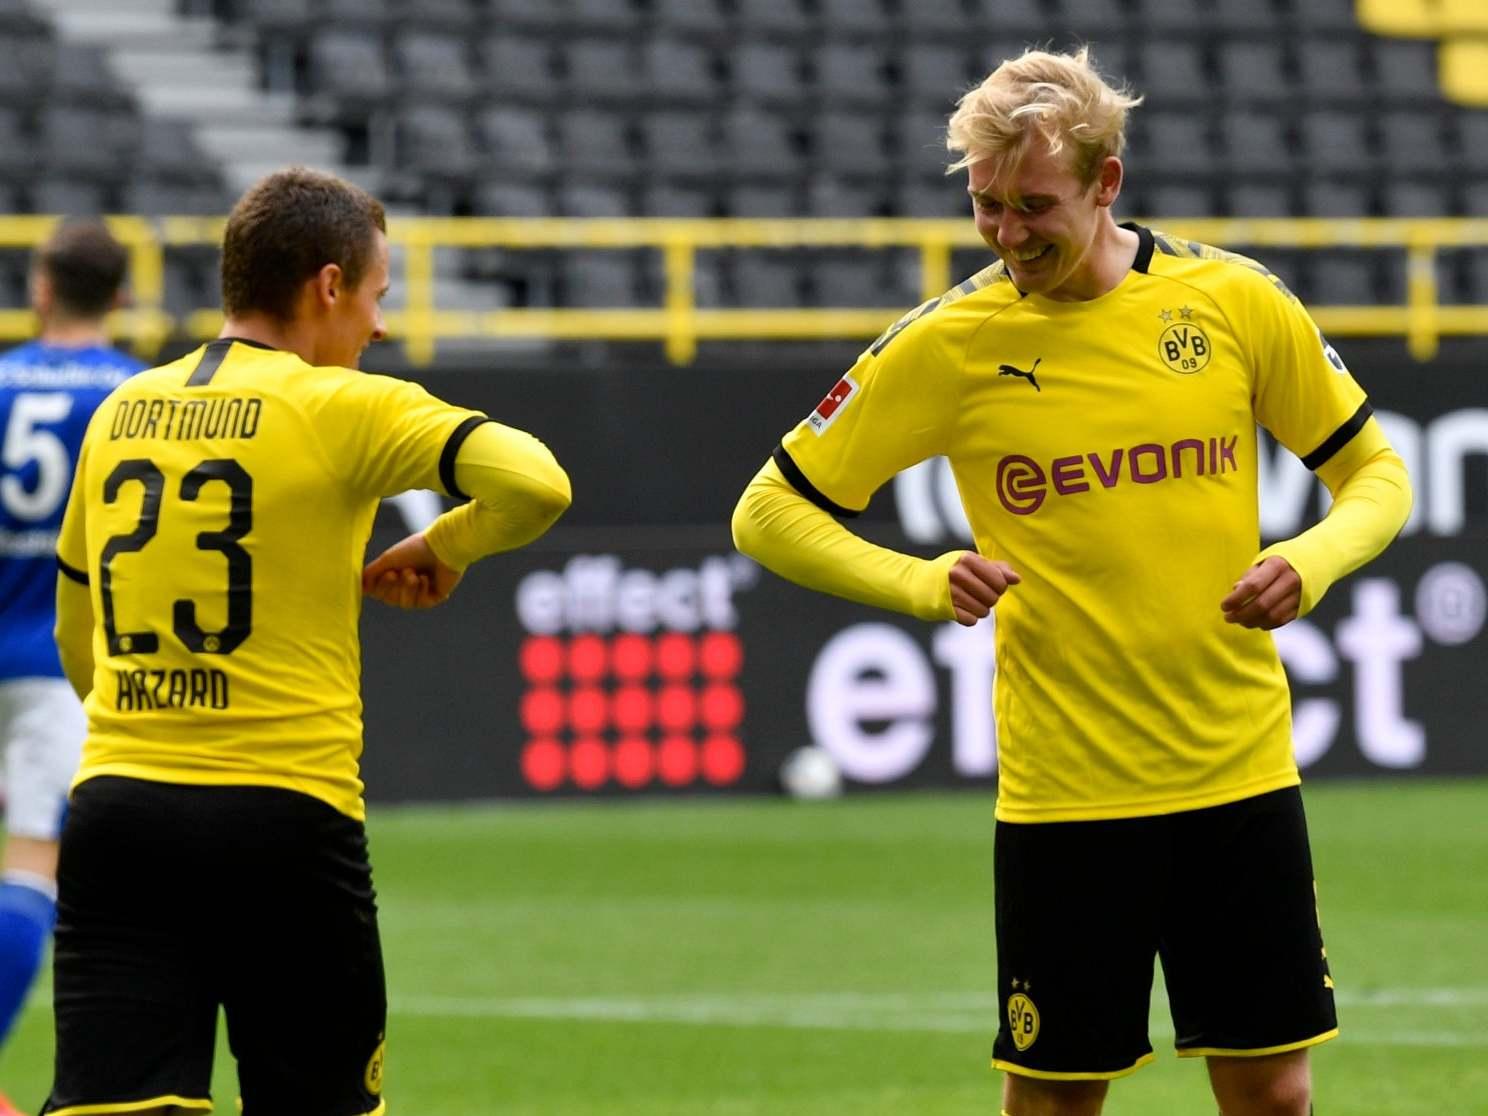 Wolfsburg vs Borussia Dortmund prediction: How will Bundesliga fixture play out today?